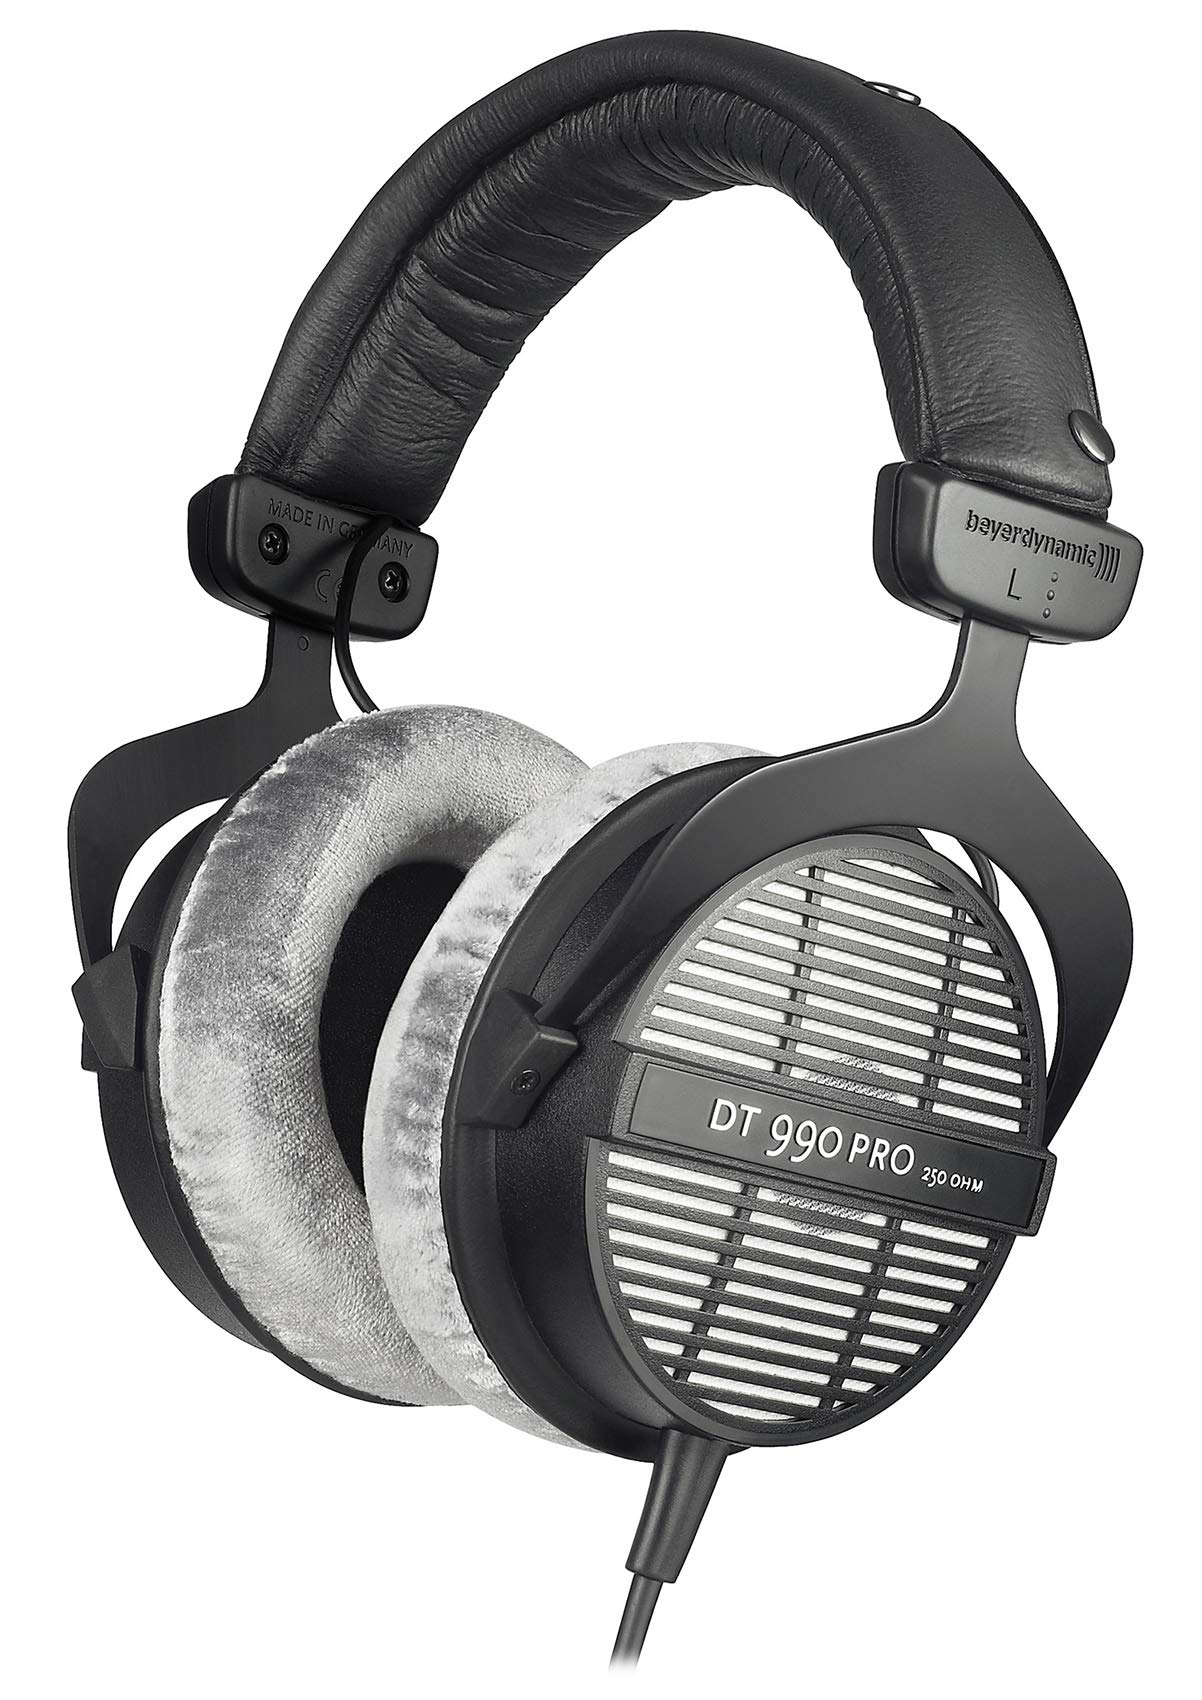 Beyerdynamic DT-990-PRO-250 Gaming Twitch Live Stream Recording Headphones